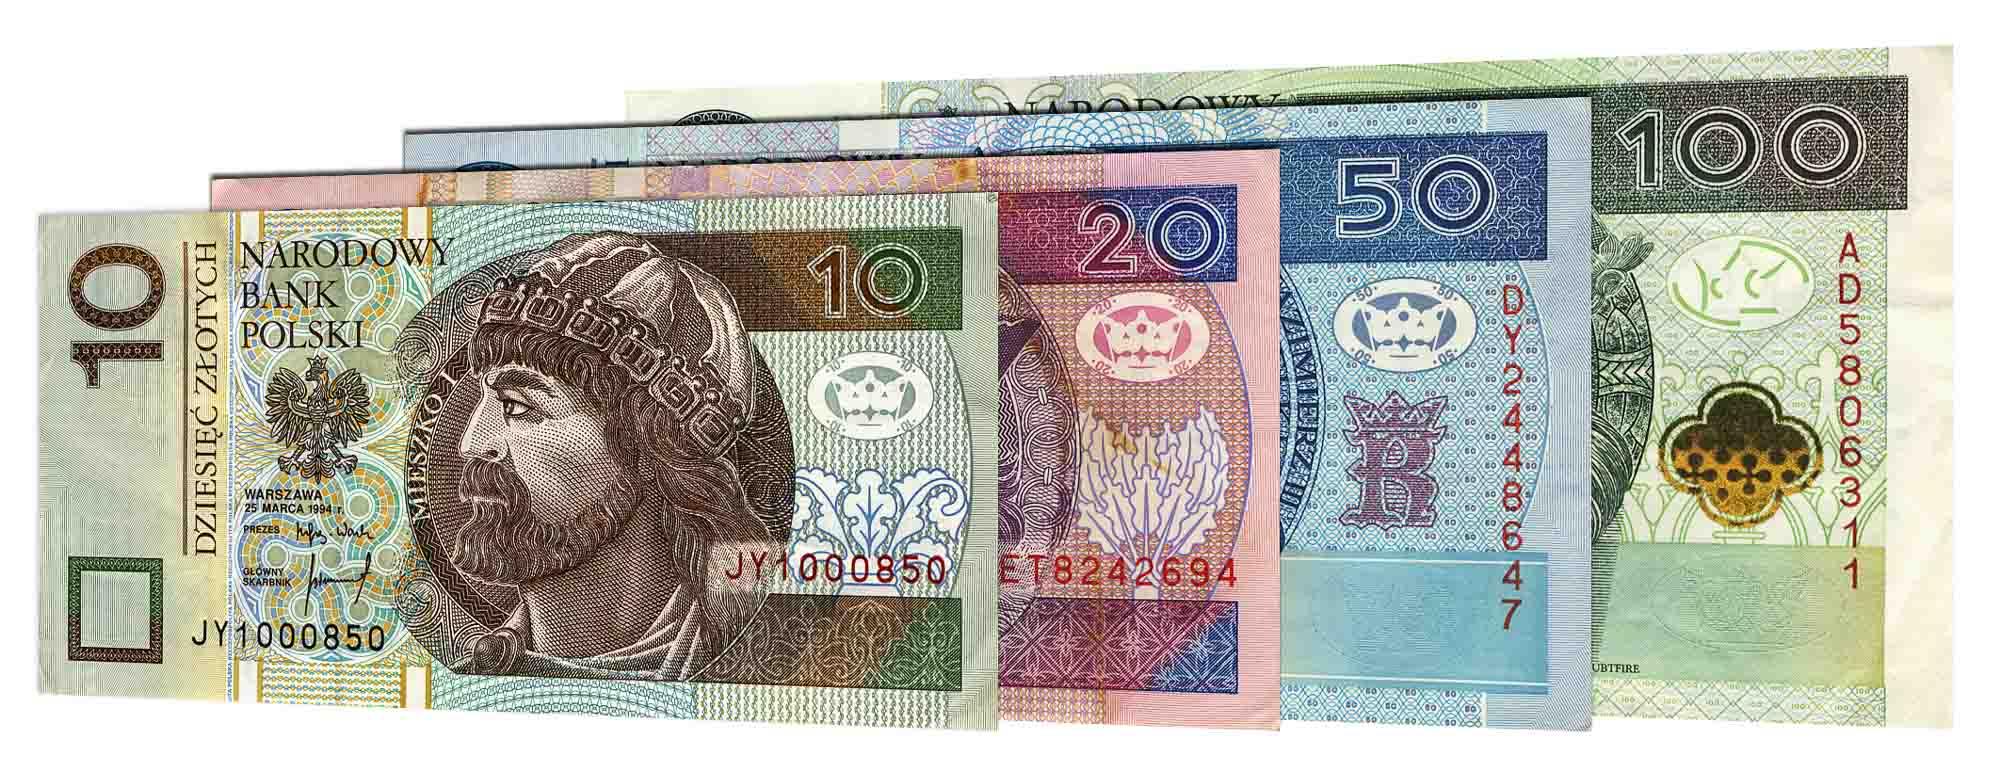 Gbp polish zloty dragon cave forum trading forex